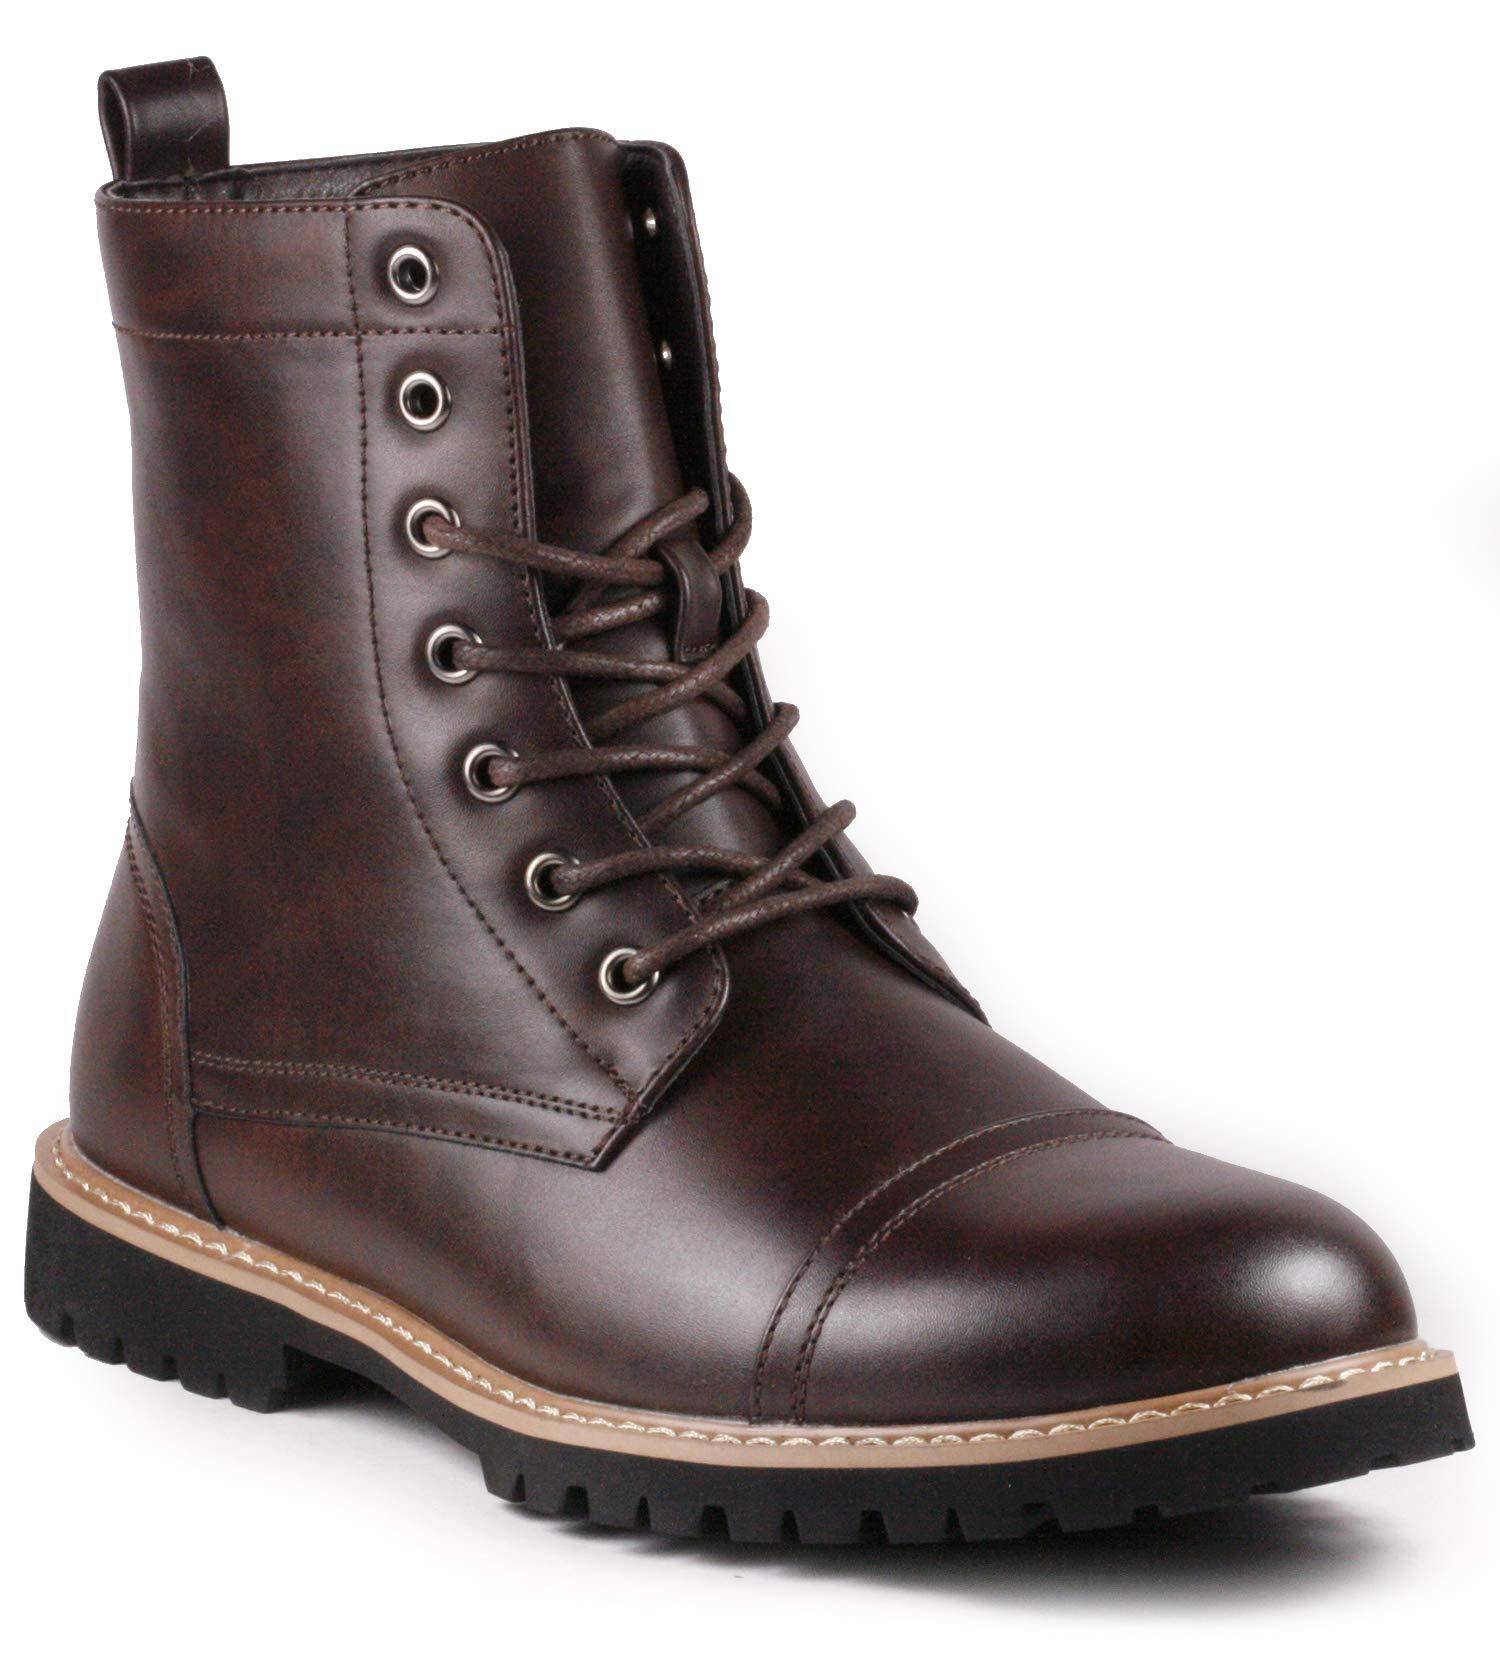 Metrocharm MC312 Men's Lace Up Cap Toe Fashion Oxford Boot (10.5, Brown) by Metrocharm